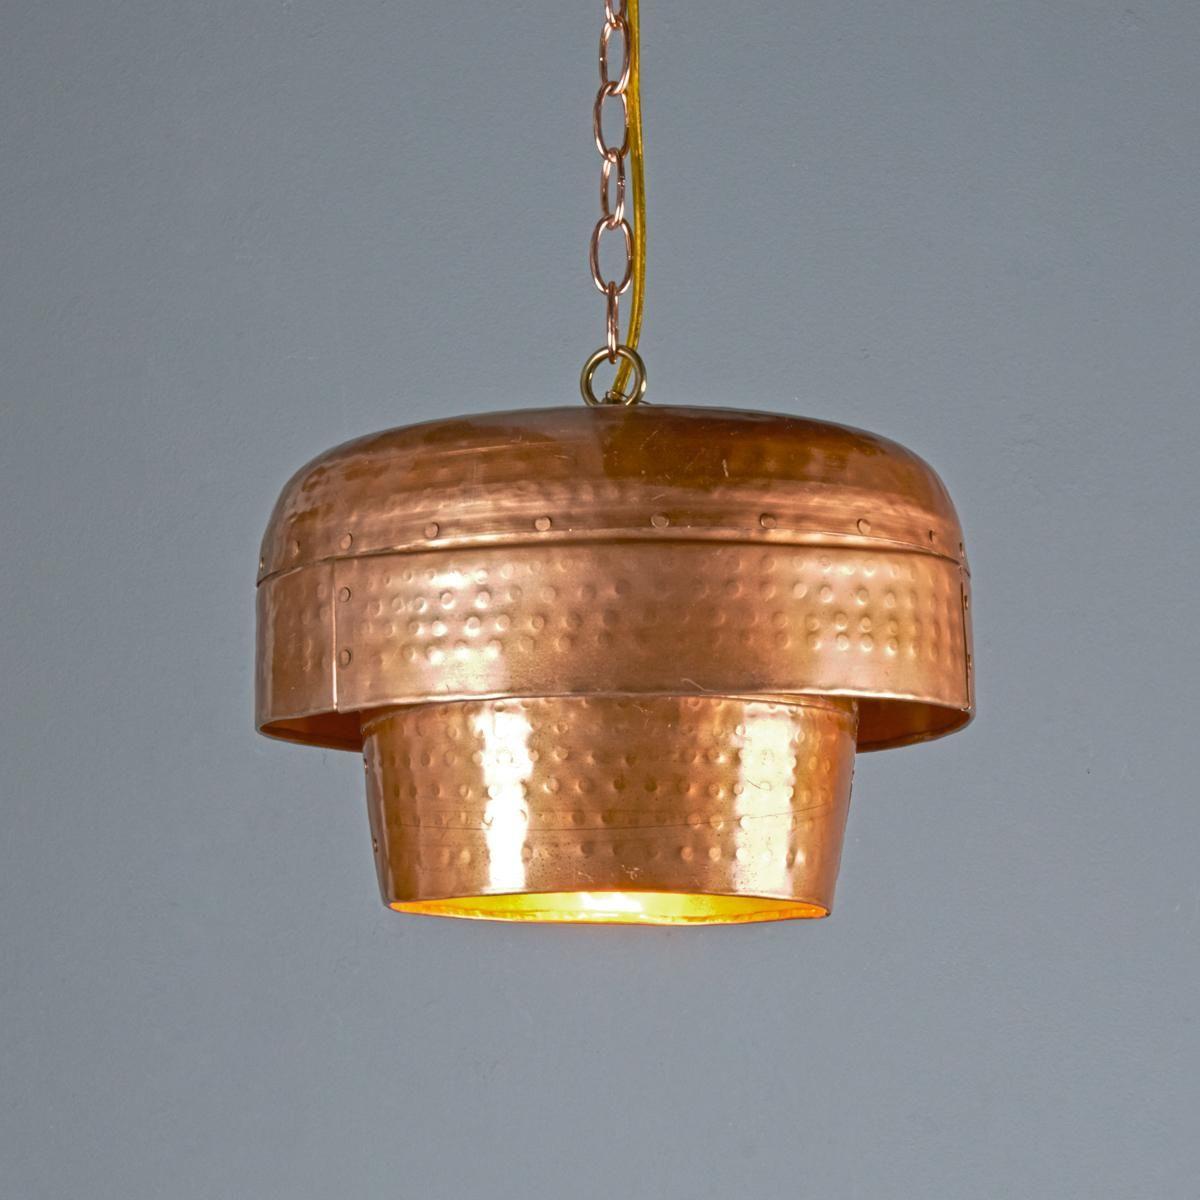 Tiered Copper Bowl Pendant Light